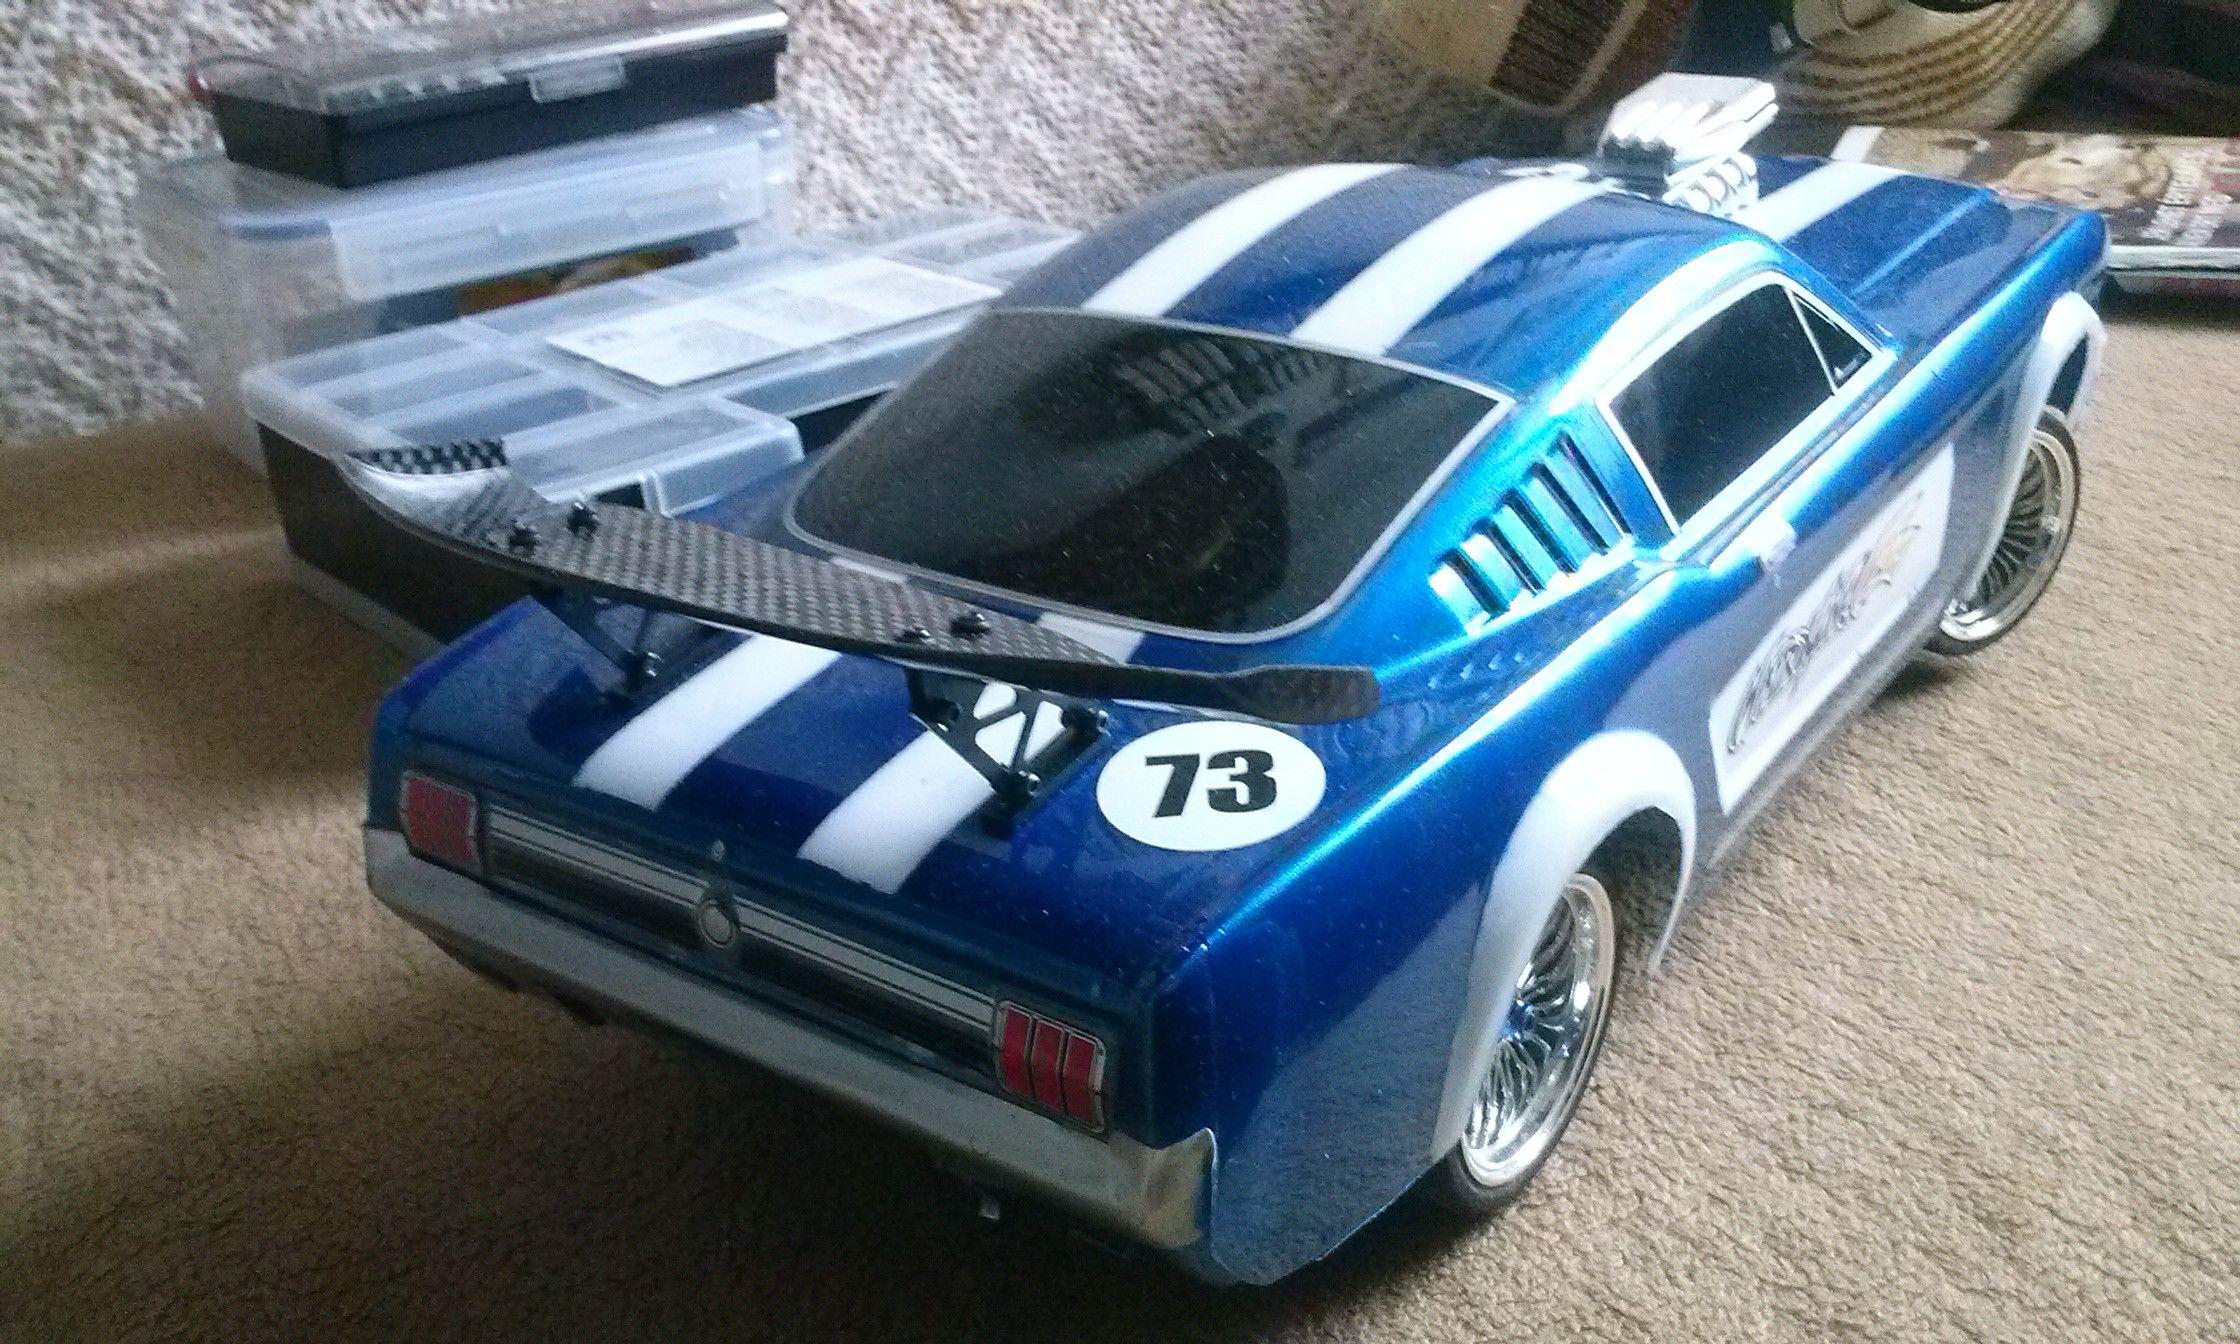 Tamiya TT01e chassis with Matrixline Mustang body.